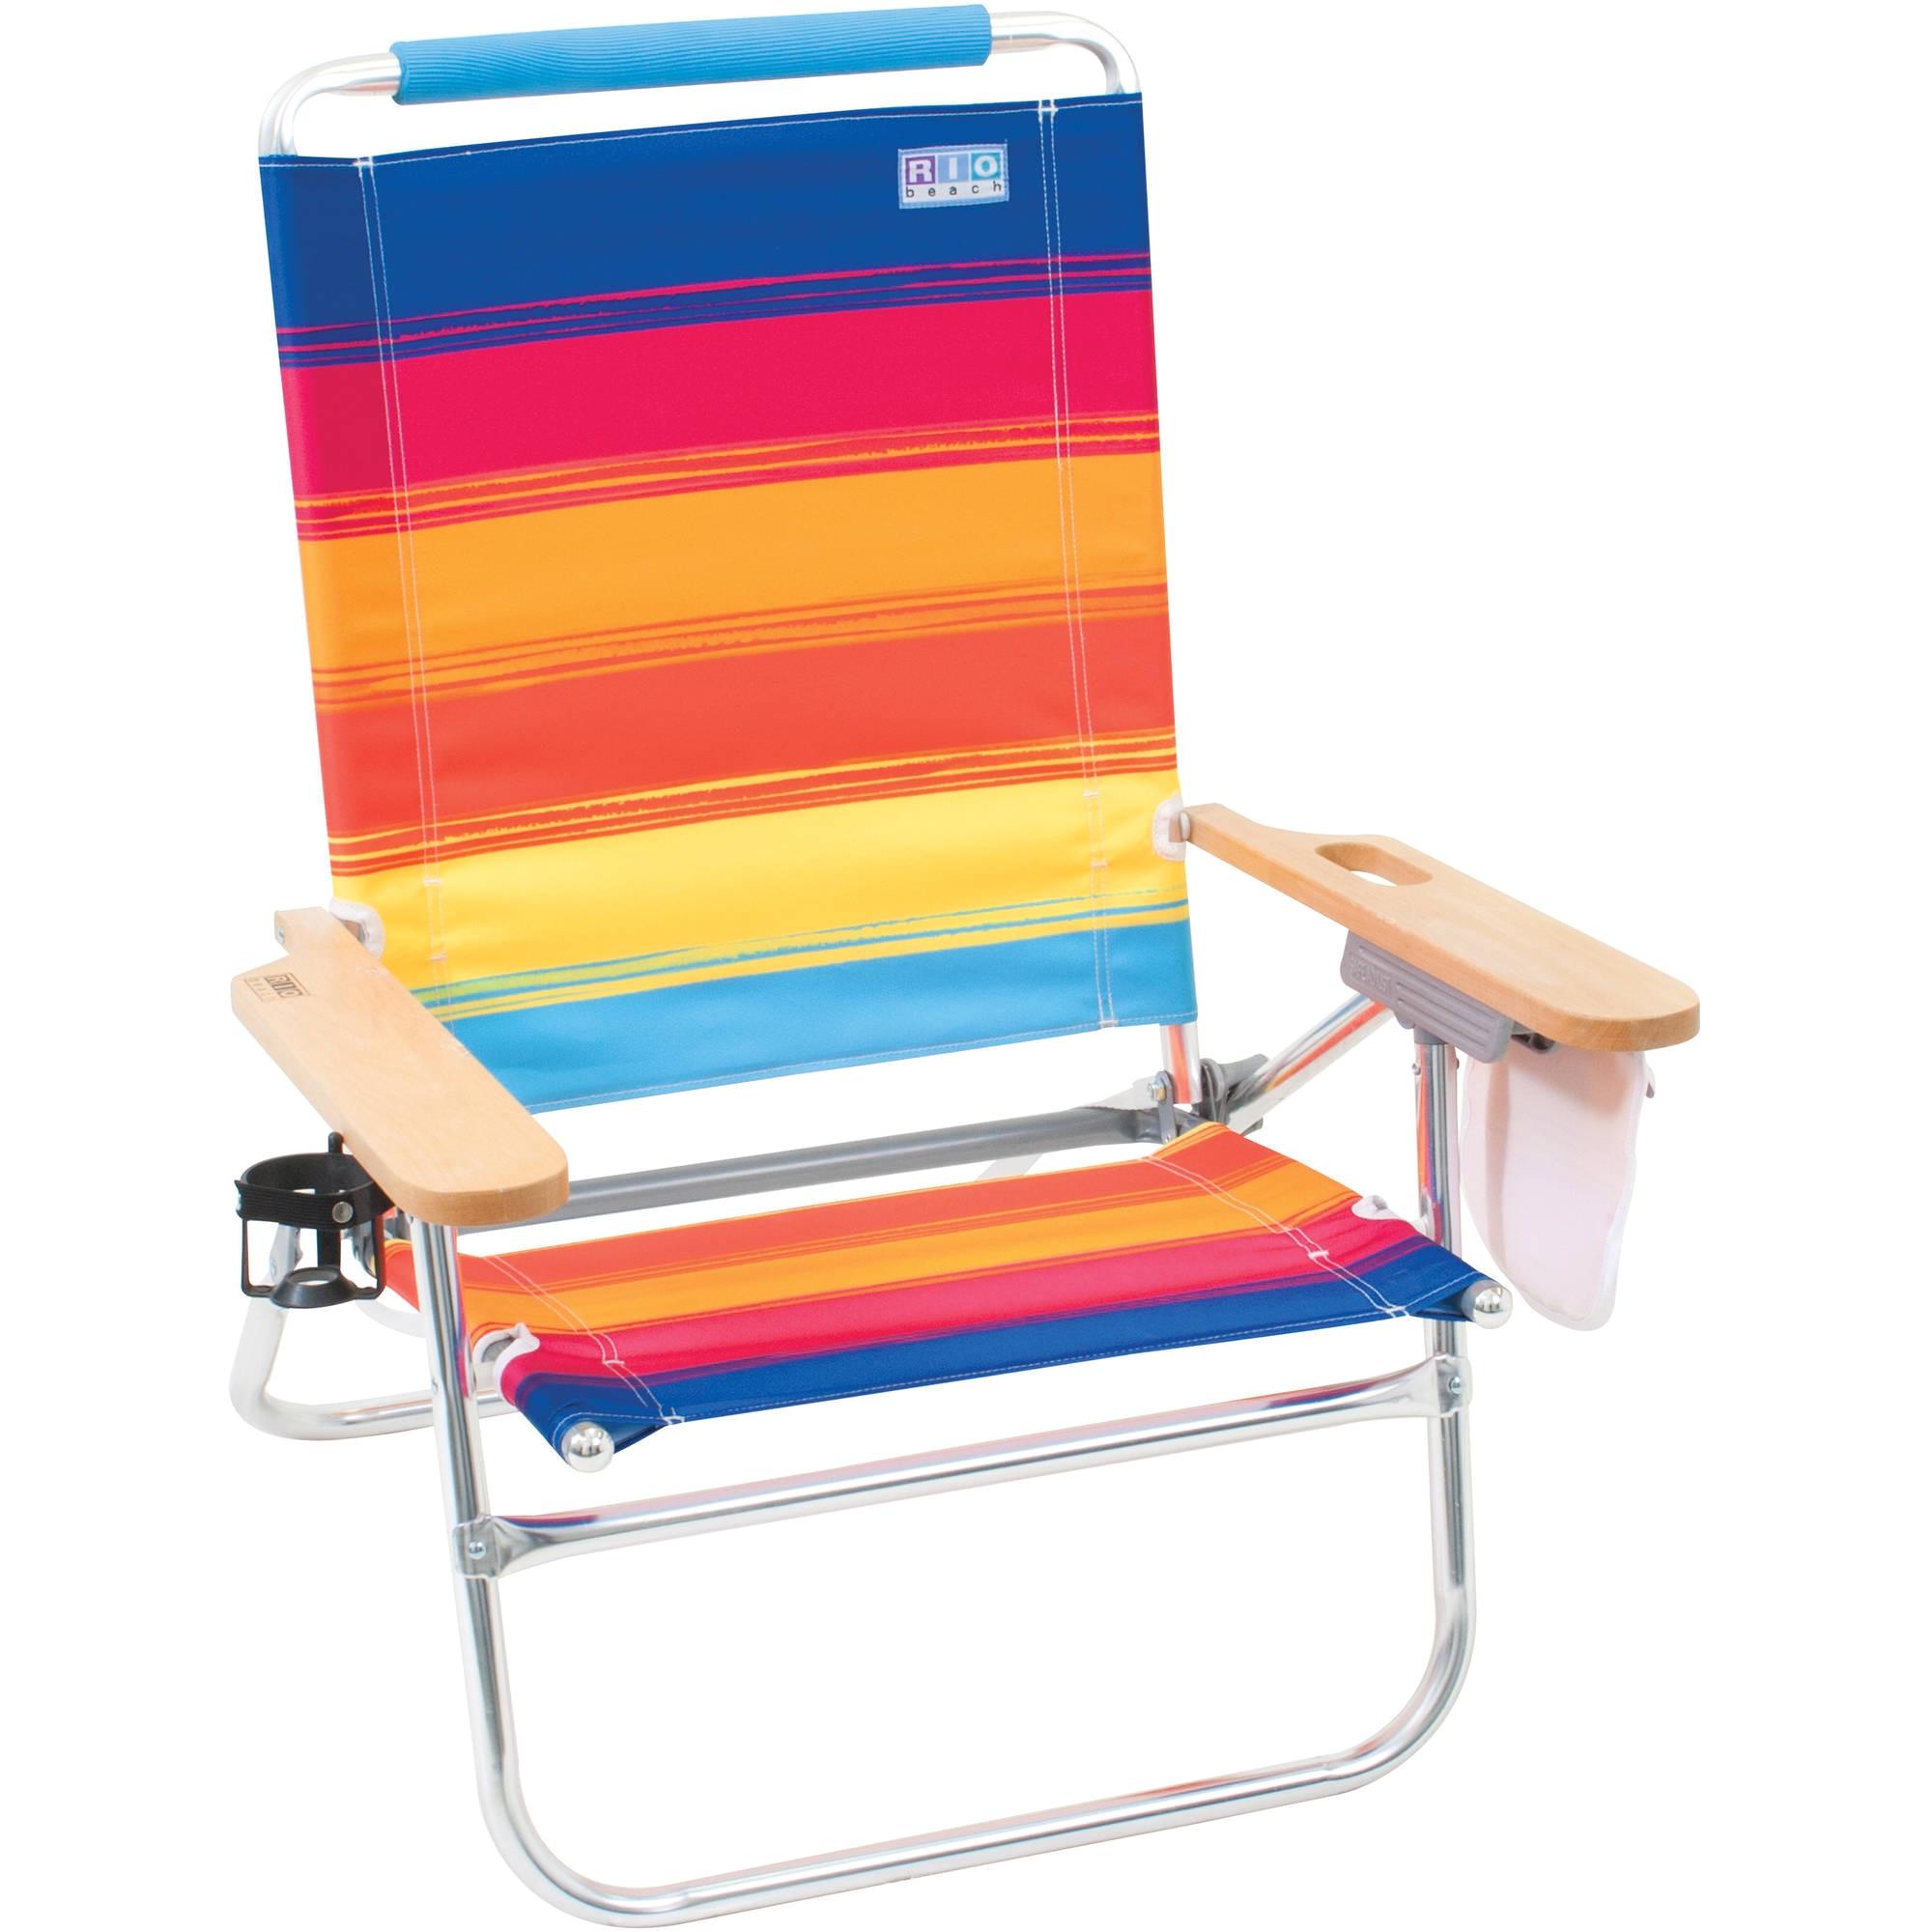 best stadium chairs unique 30 luxury plastic lawn chairs walmart design jsmorganicsfarm gallery